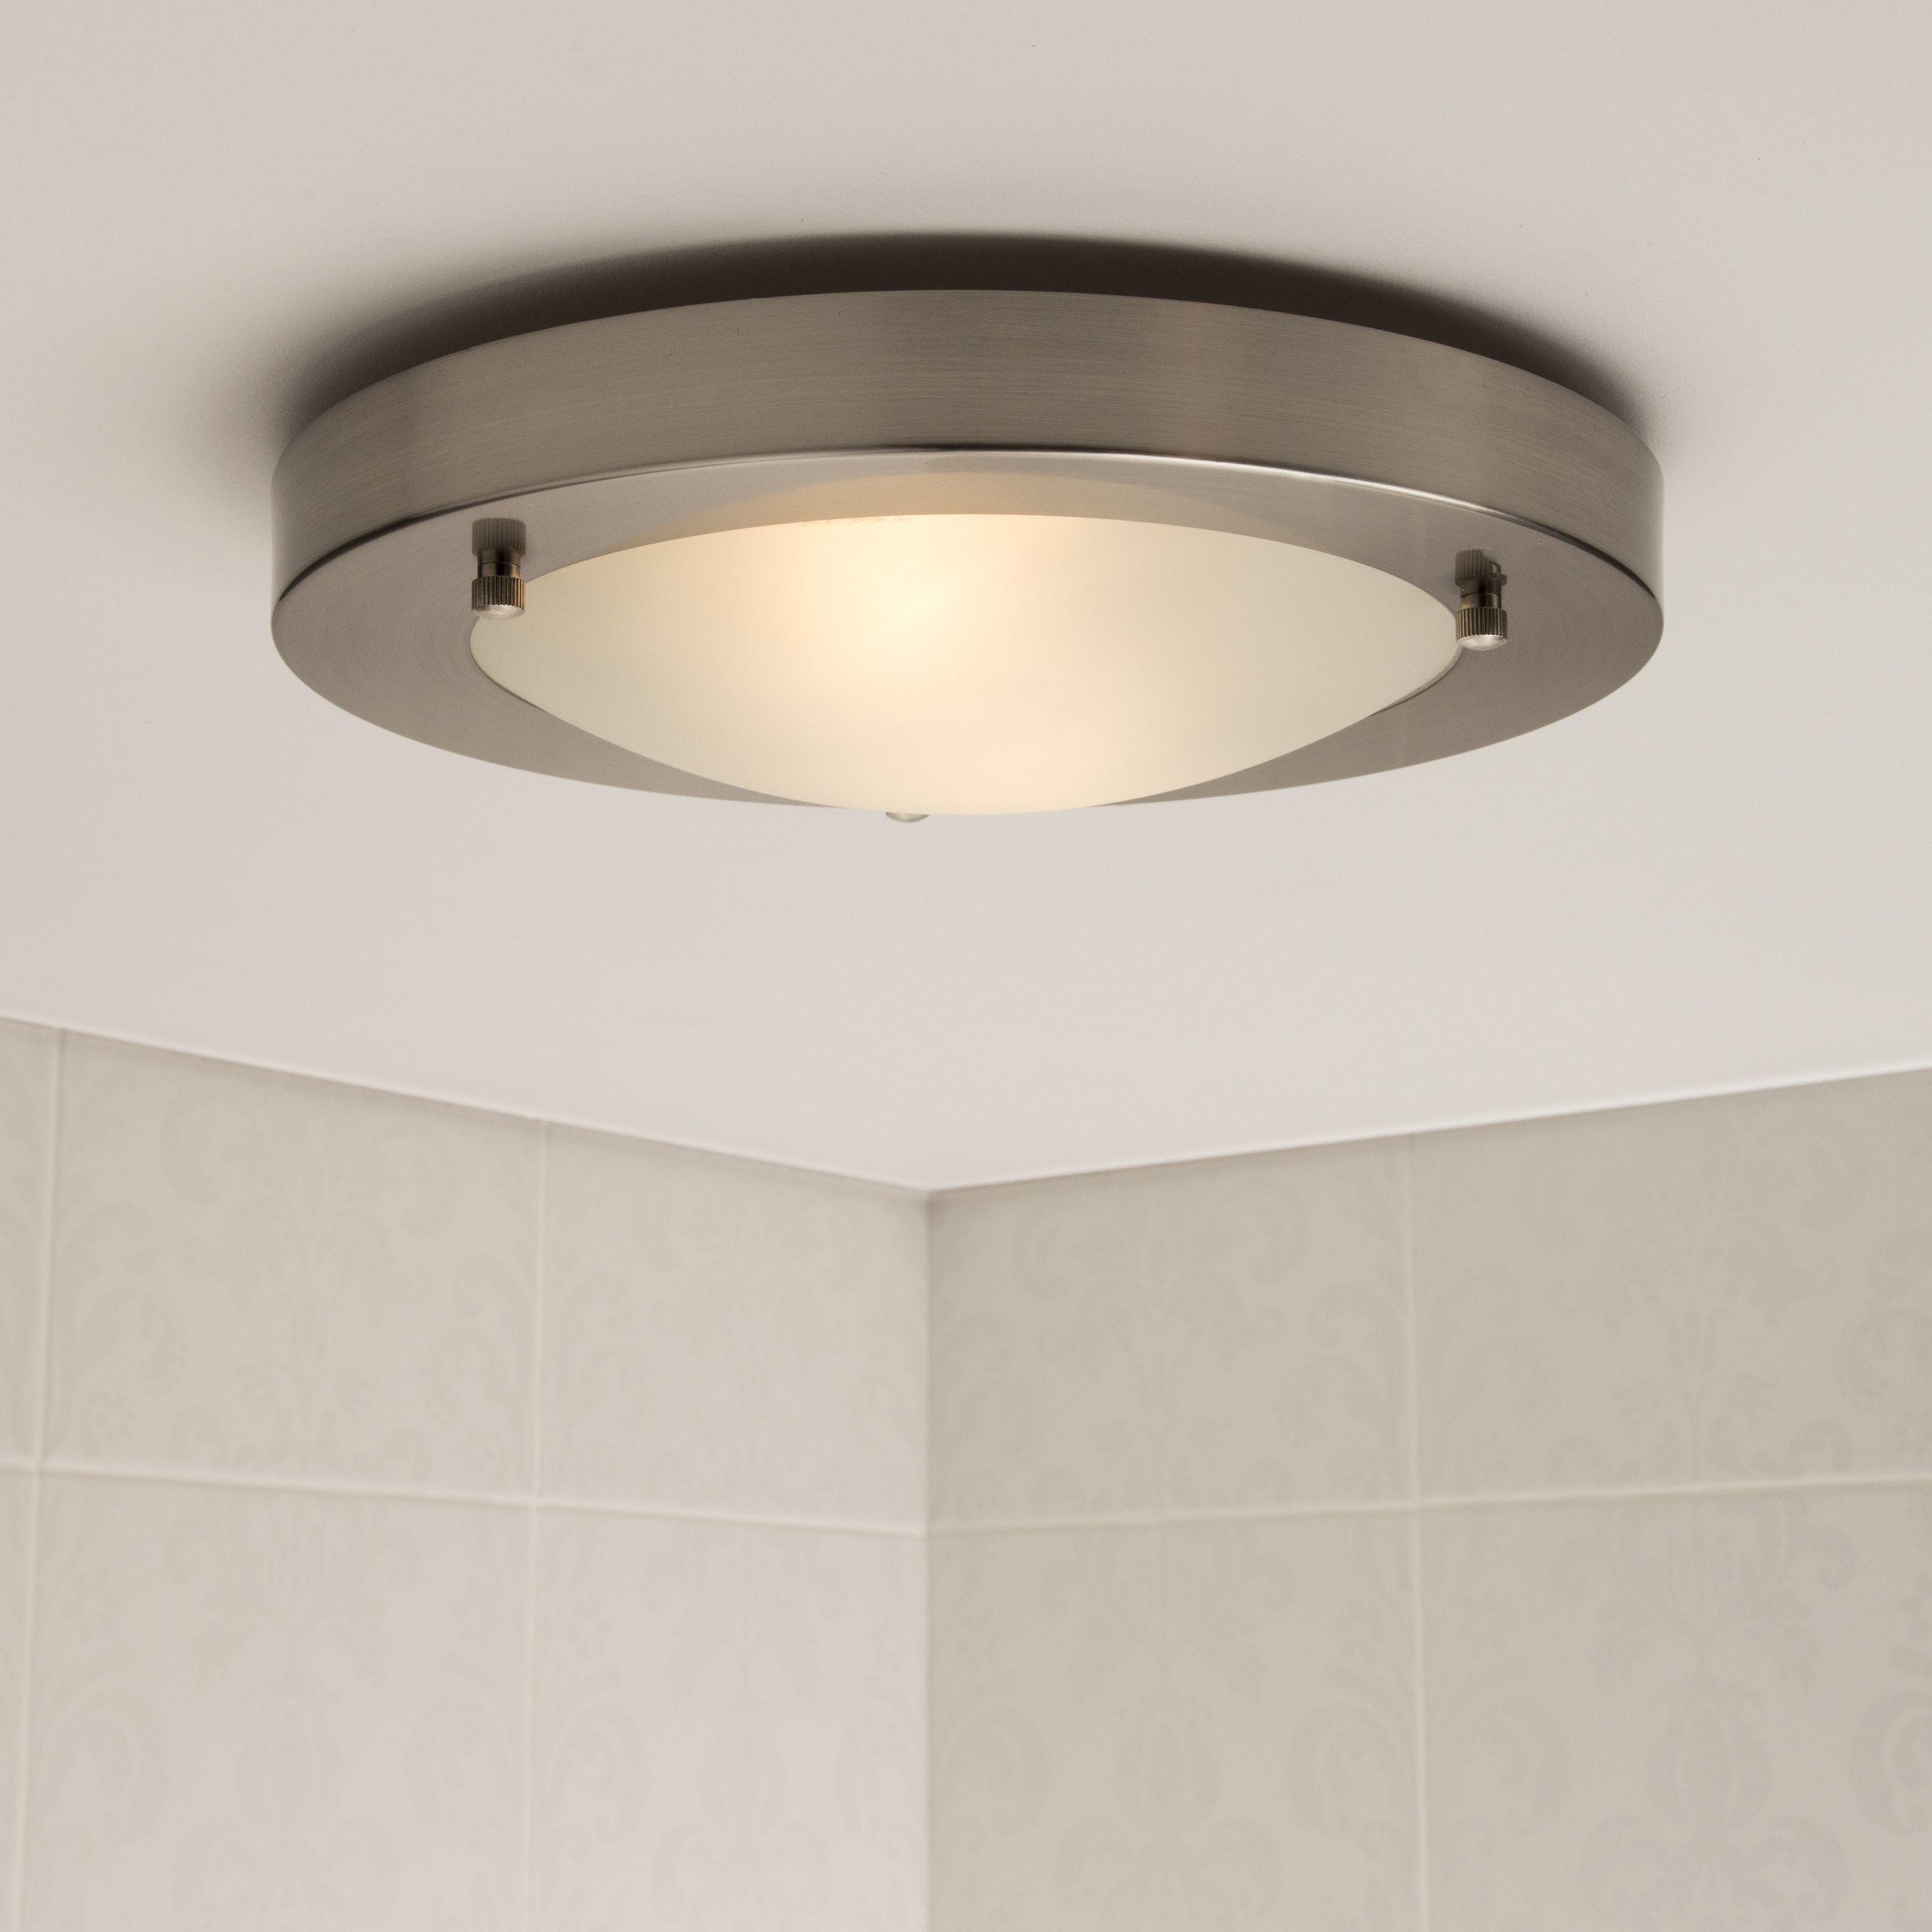 Forum Canis Large Flush Fitting Bathroom Light Bathroom Ceiling